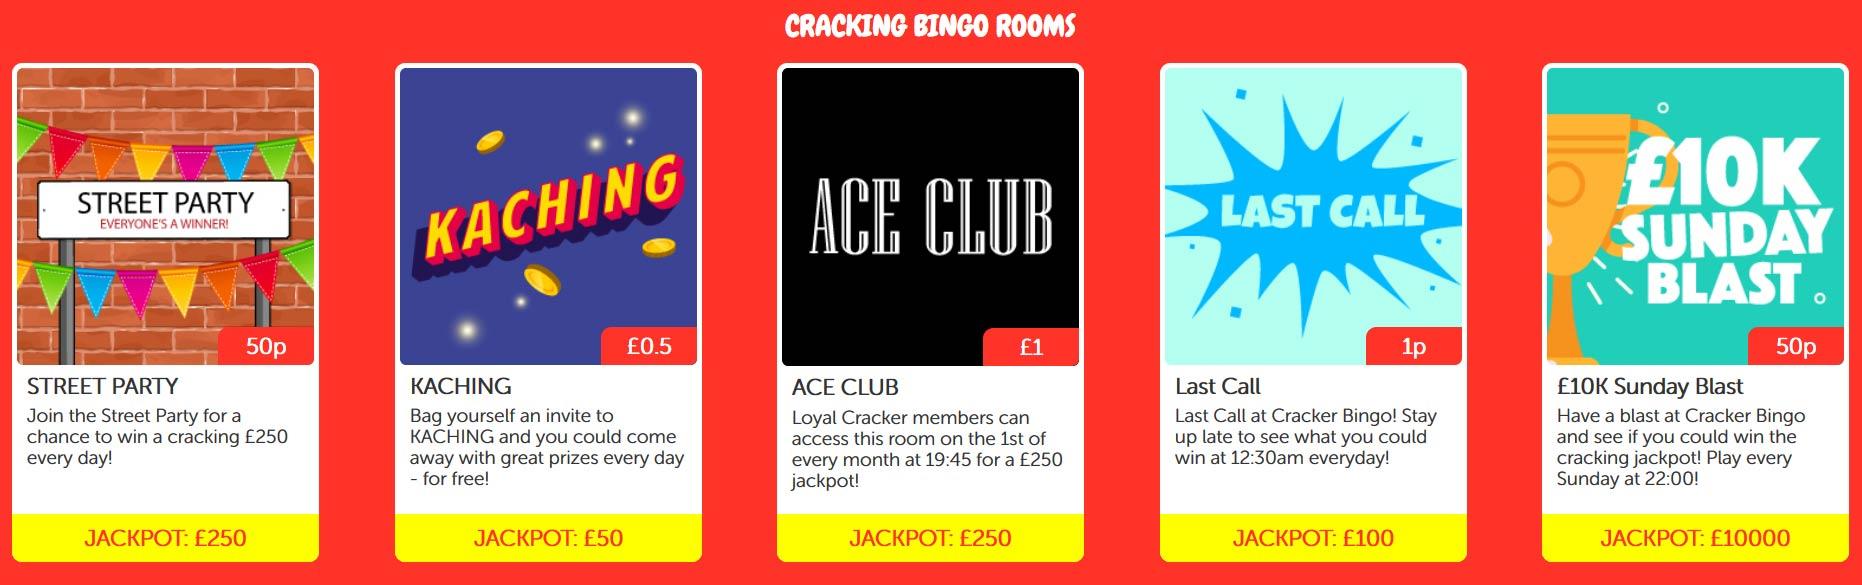 Cracker Bingo Games